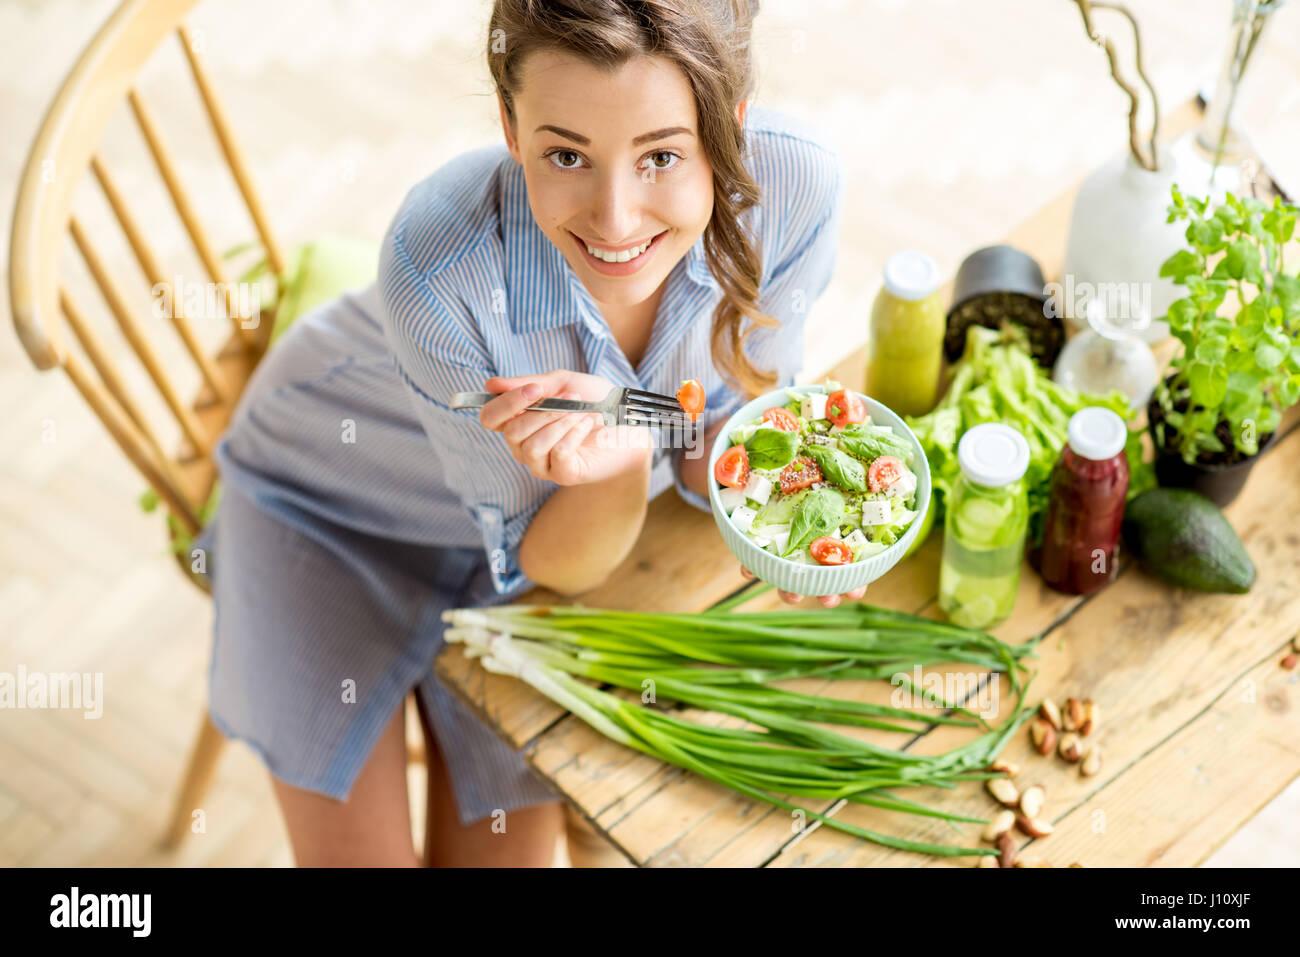 Woman eating healthy salad - Stock Image